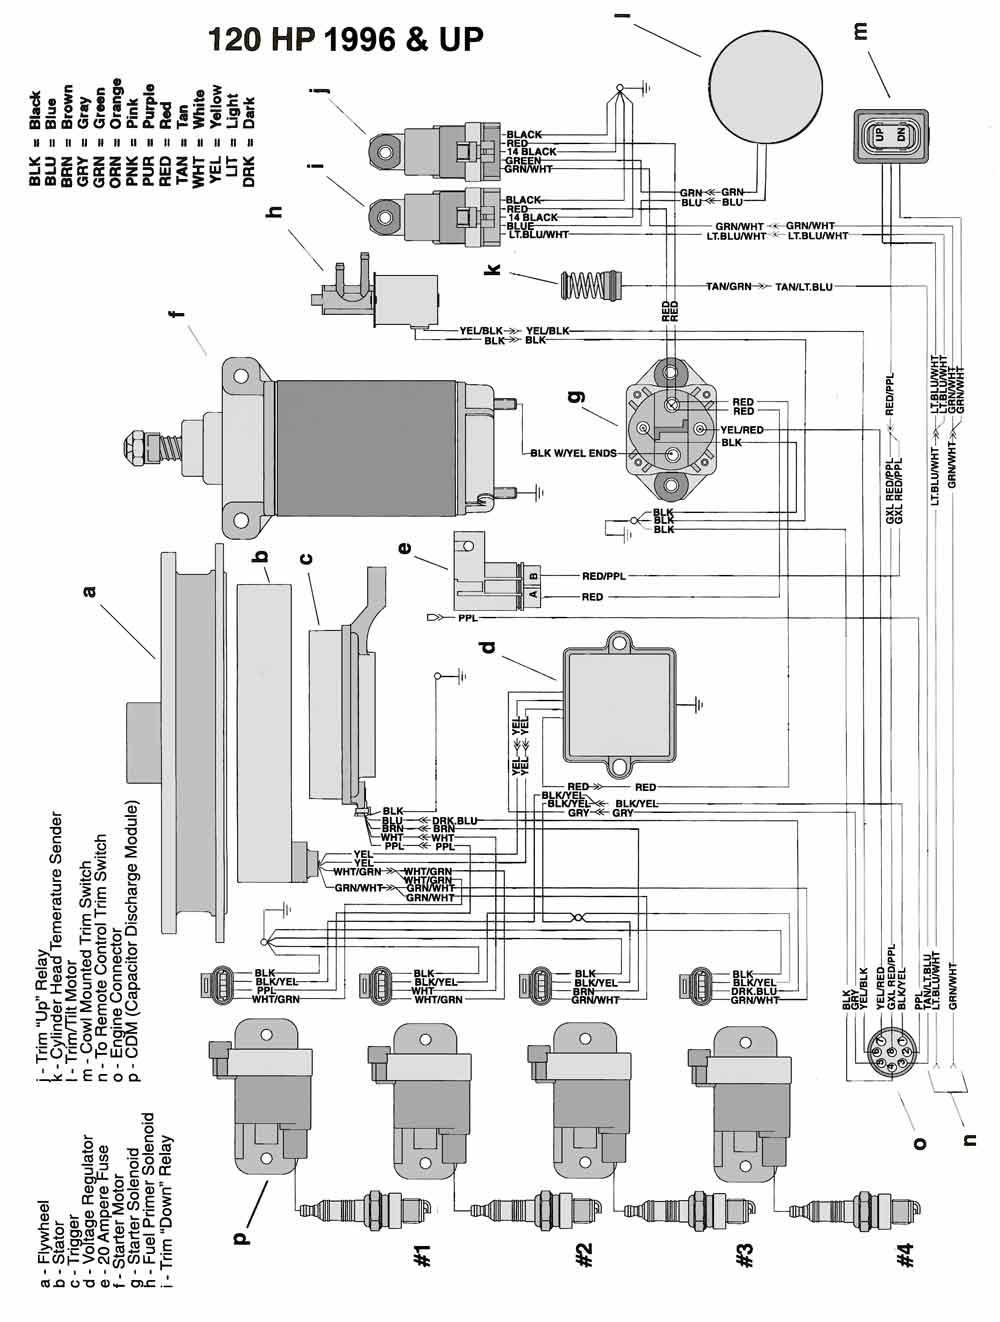 Enjoyable Chris Craft Wiring Diagrams Wiring Diagram Wiring Cloud Uslyletkolfr09Org